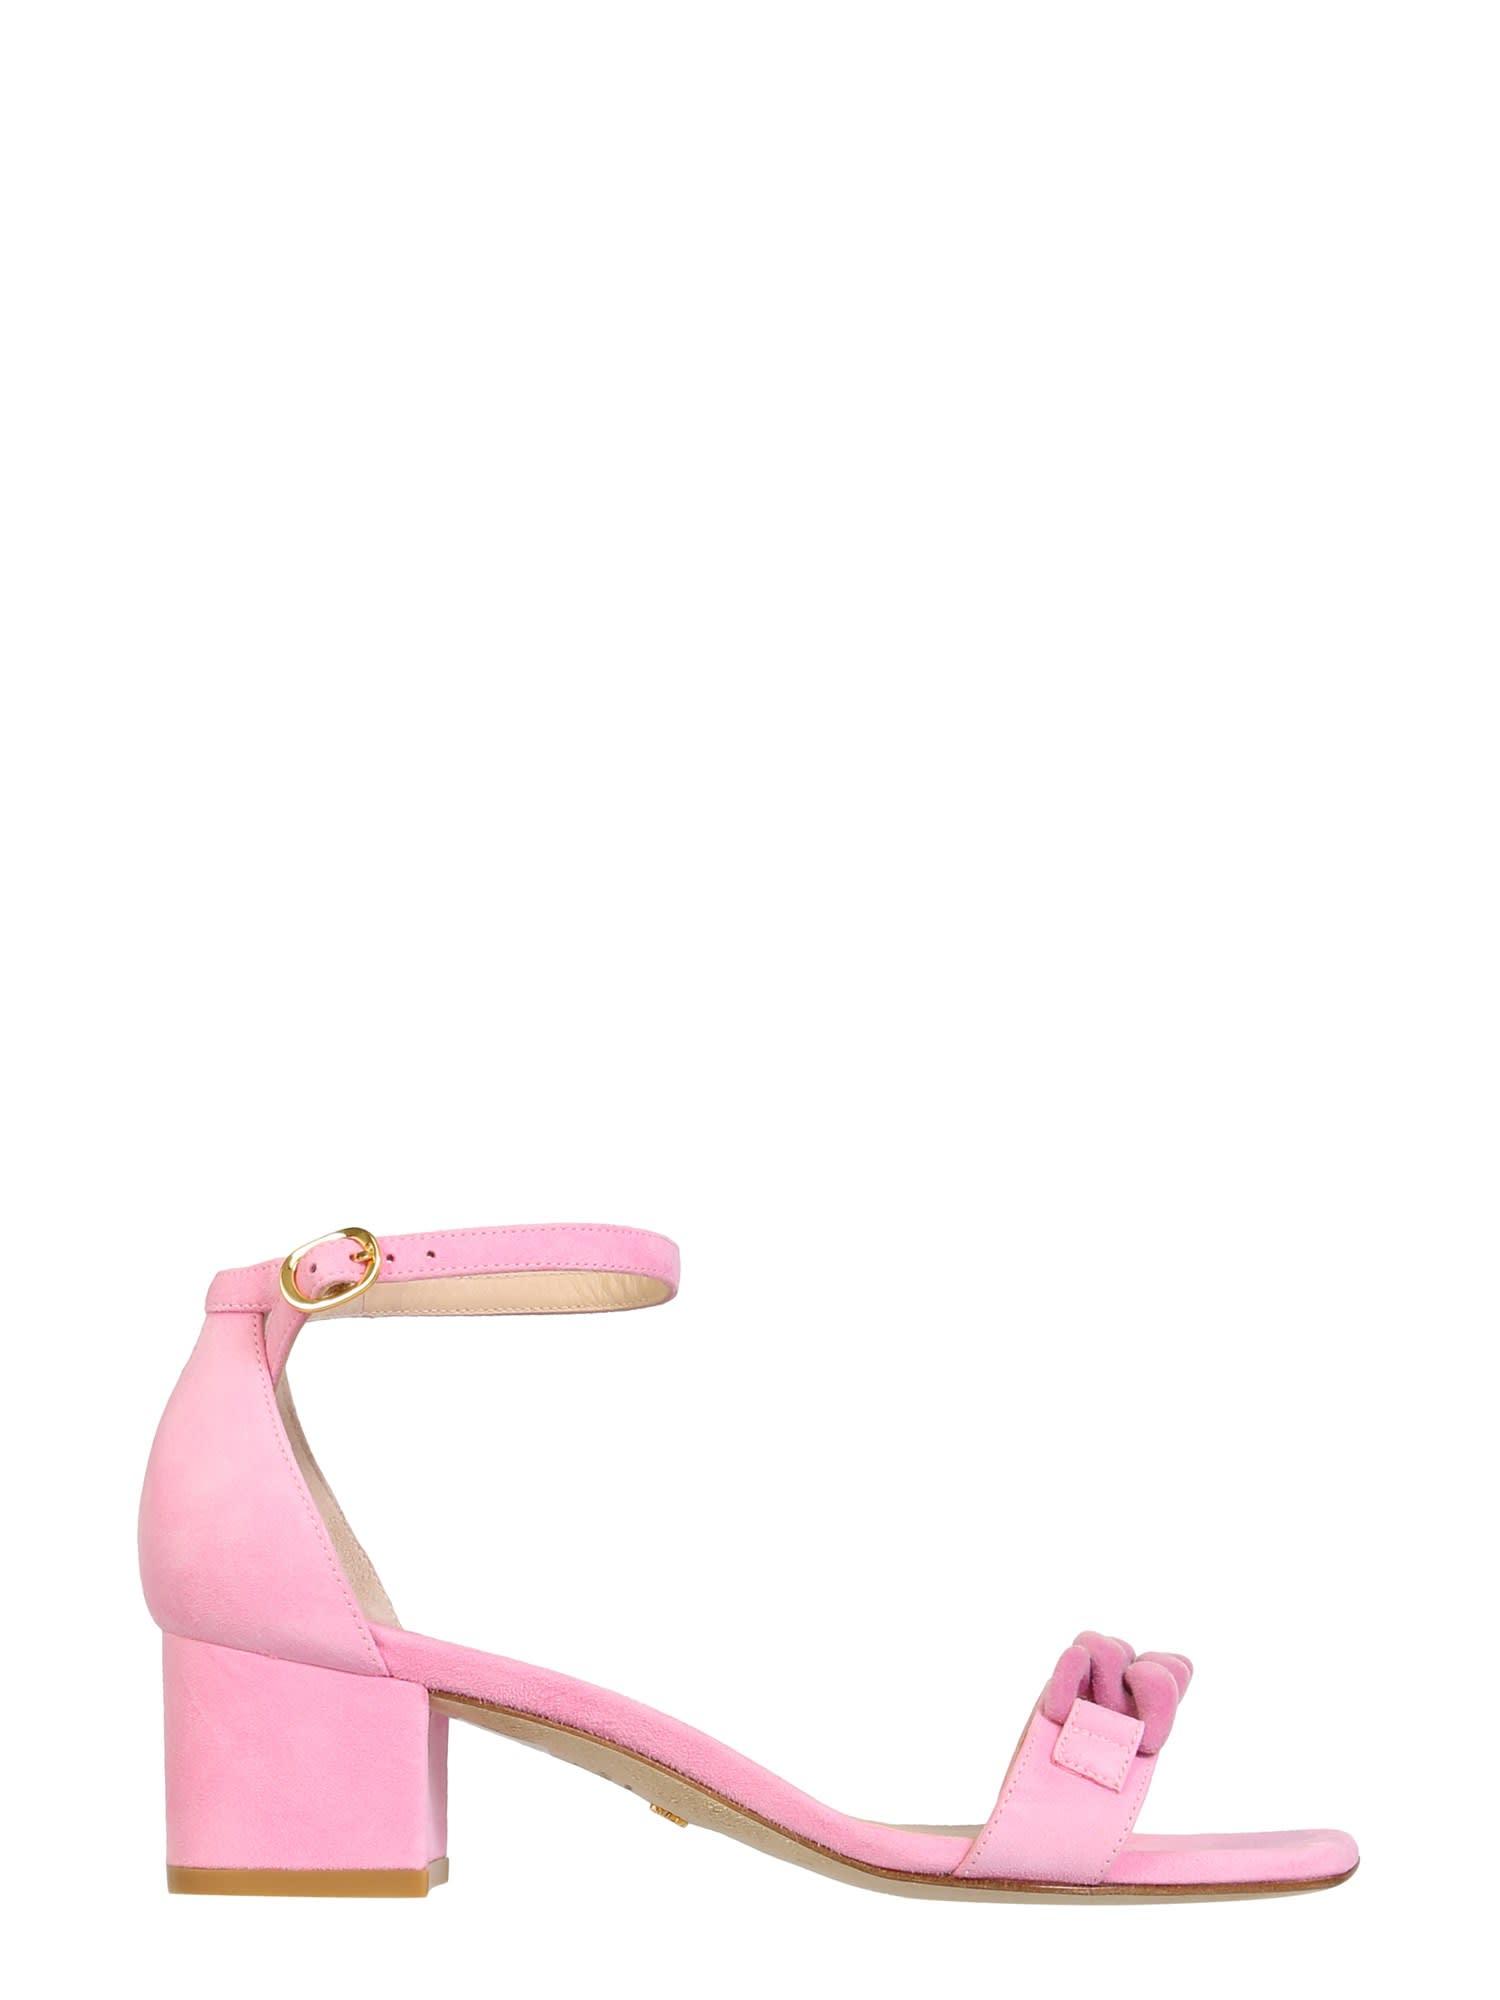 Buy Stuart Weitzman Amelina Sandals online, shop Stuart Weitzman shoes with free shipping